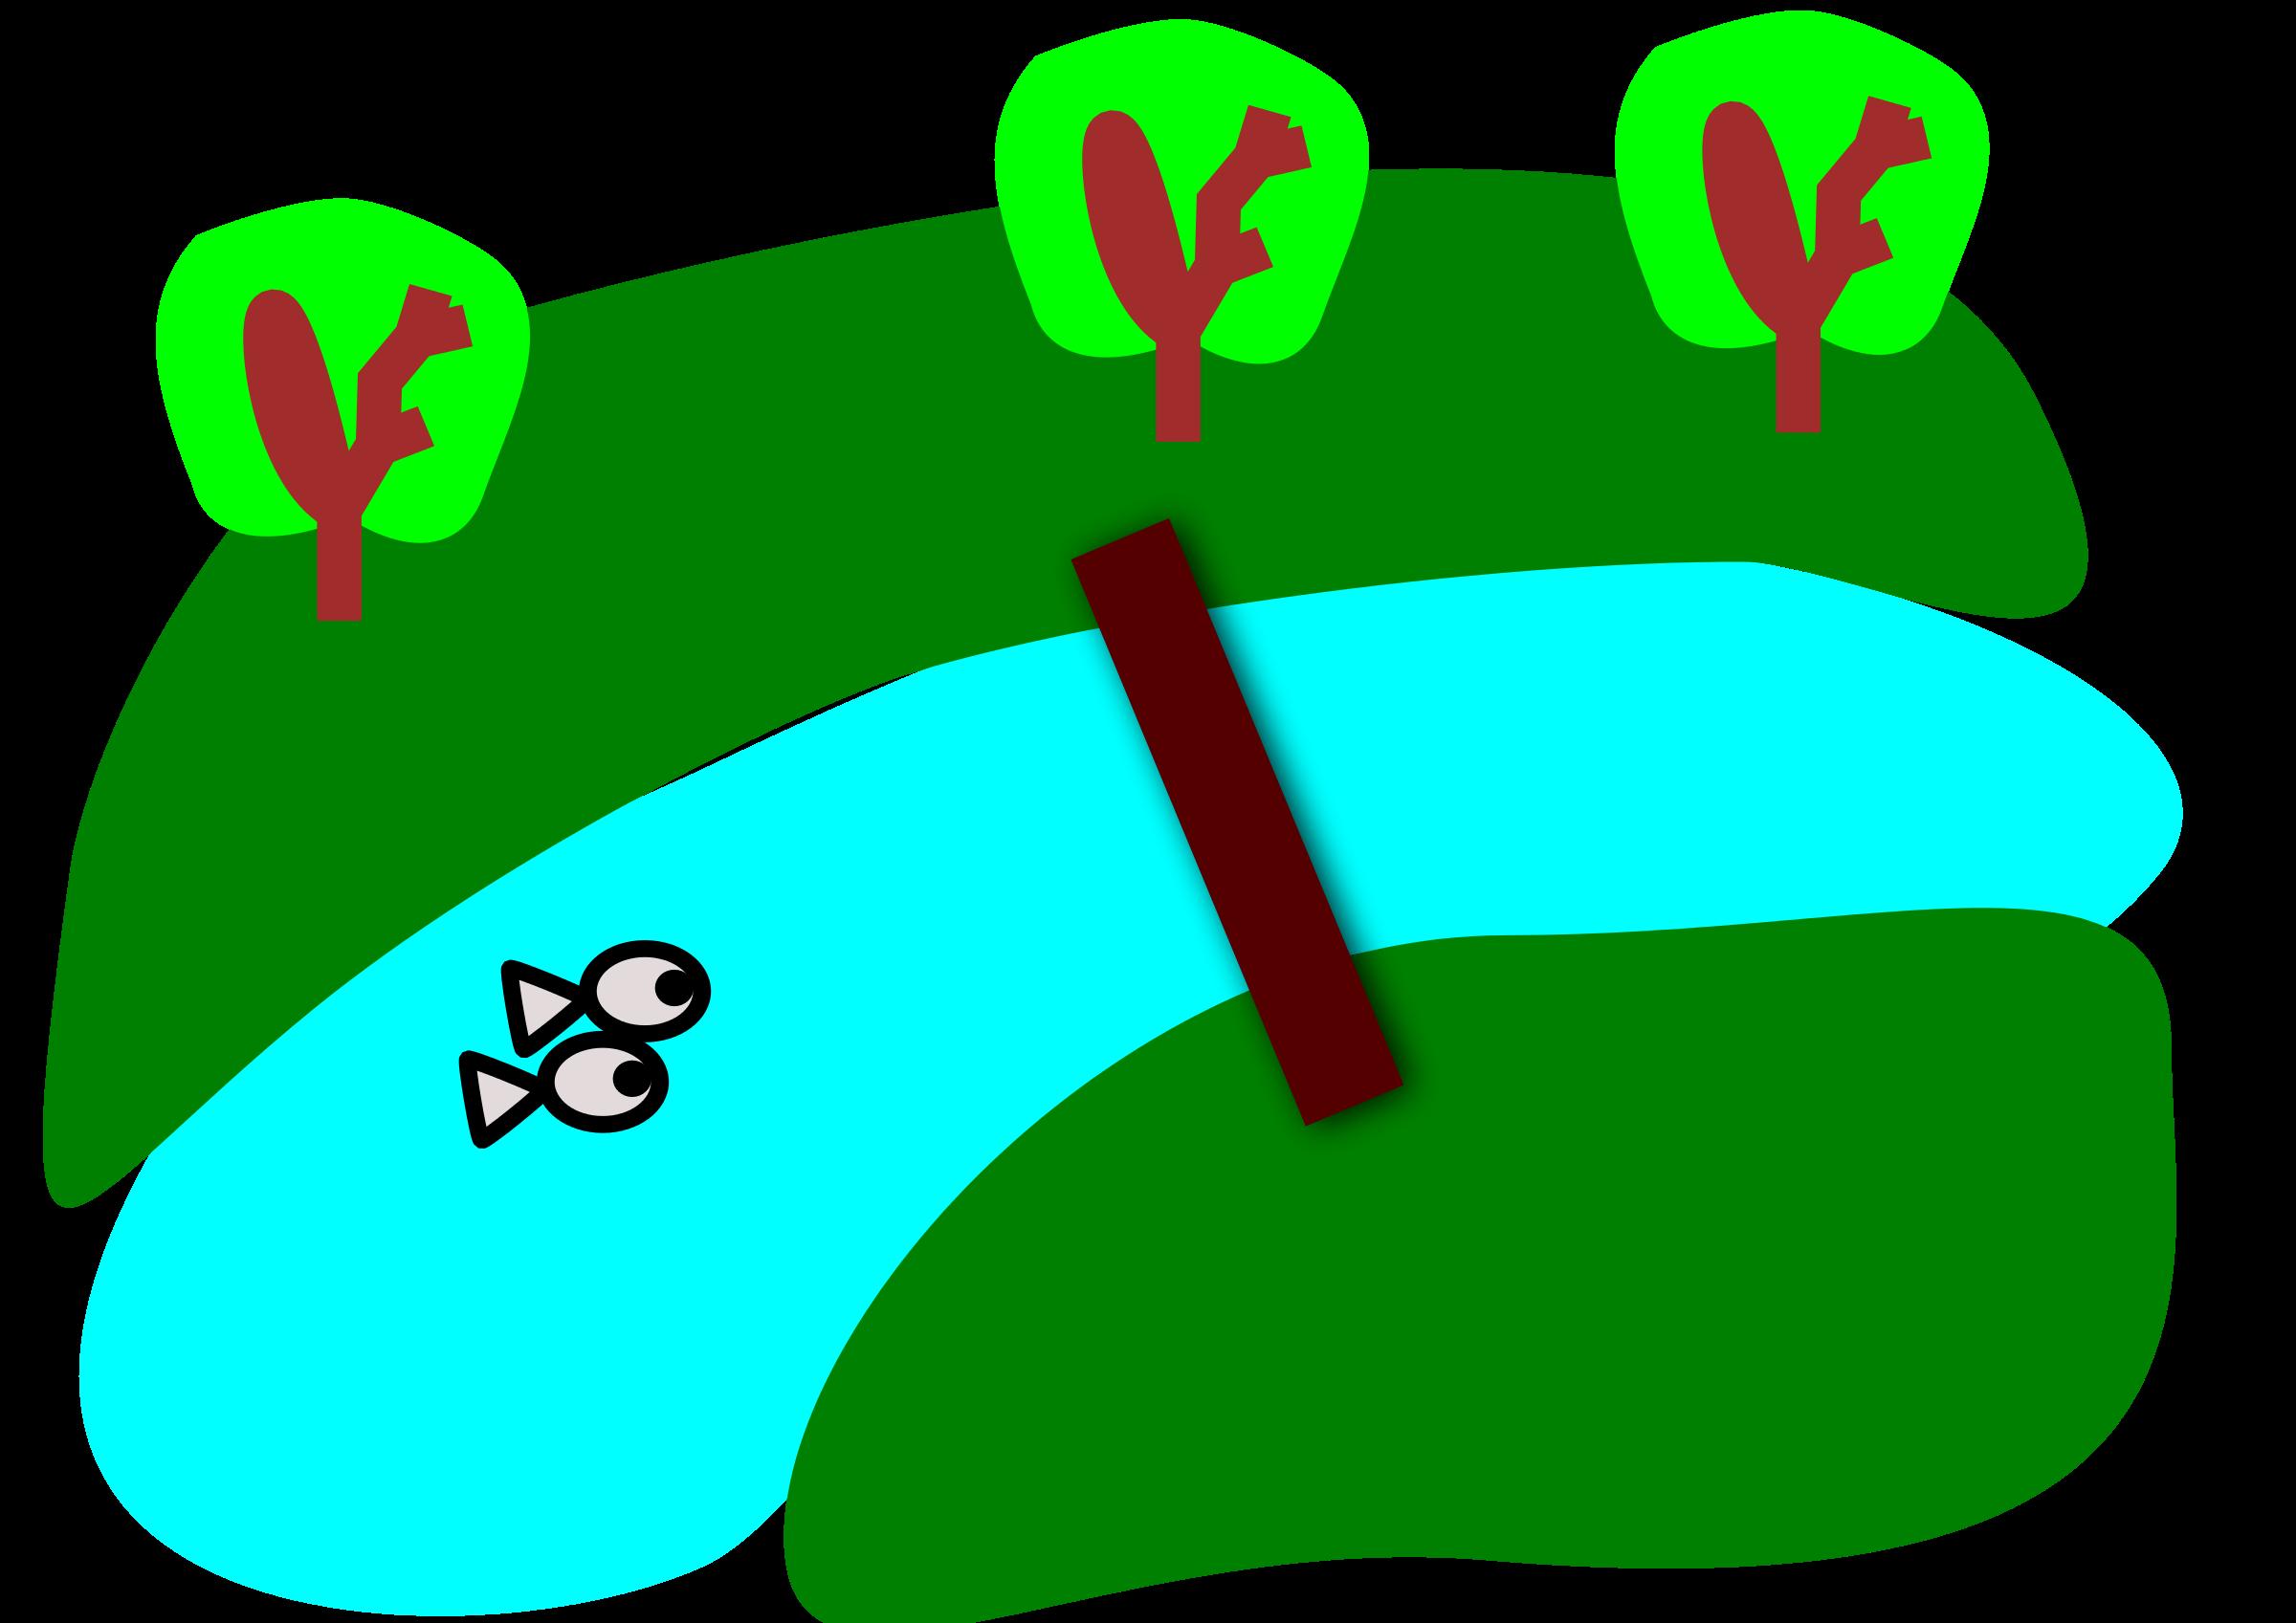 River clipart clip freeuse River Clip Art Free | Clipart Panda - Free Clipart Images clip freeuse